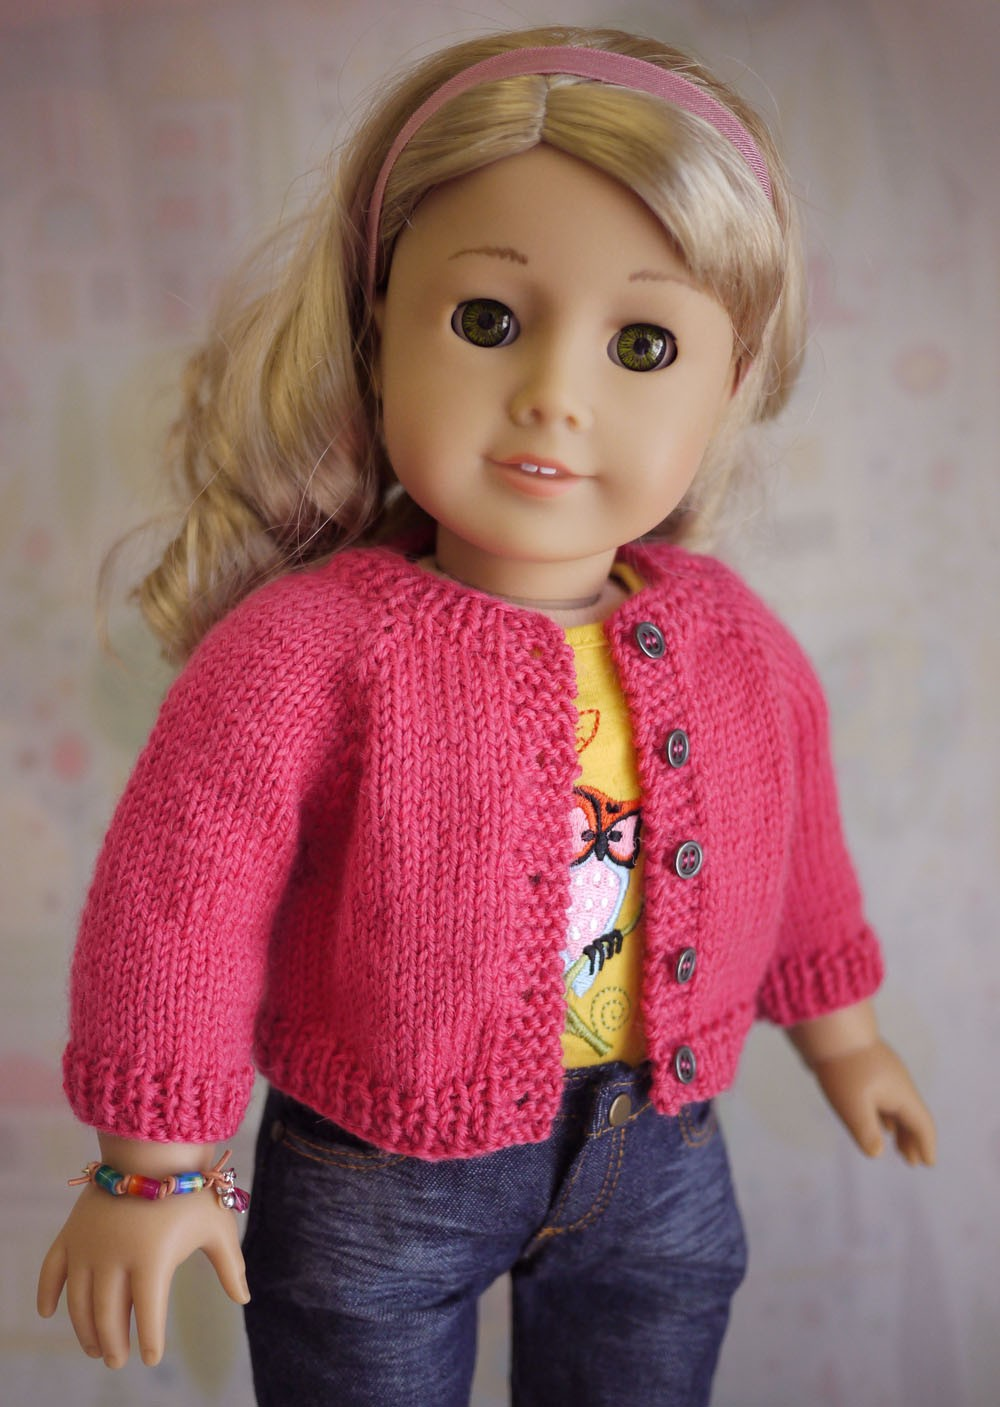 Free Easy Knitting Patterns For Dolls : Knitting Patterns for American Girl Dolls A Knitting Blog